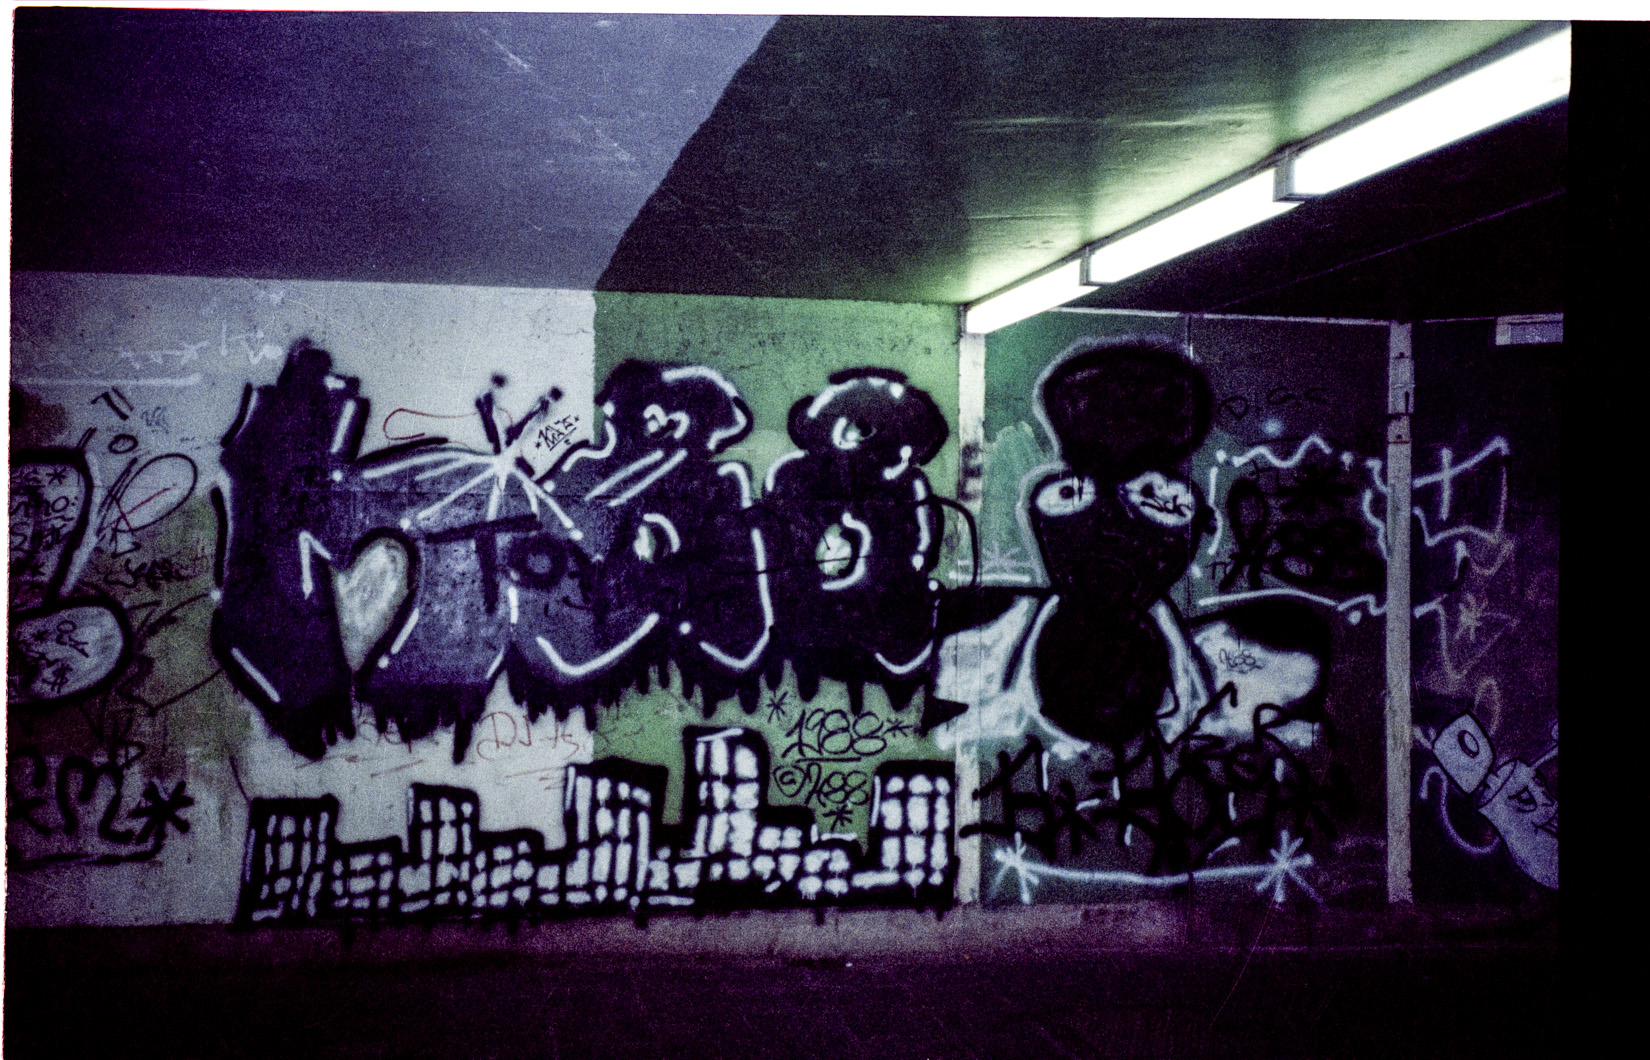 Frankfurt_Graffiti_1988_1989_H88_FRC (18 von 25)